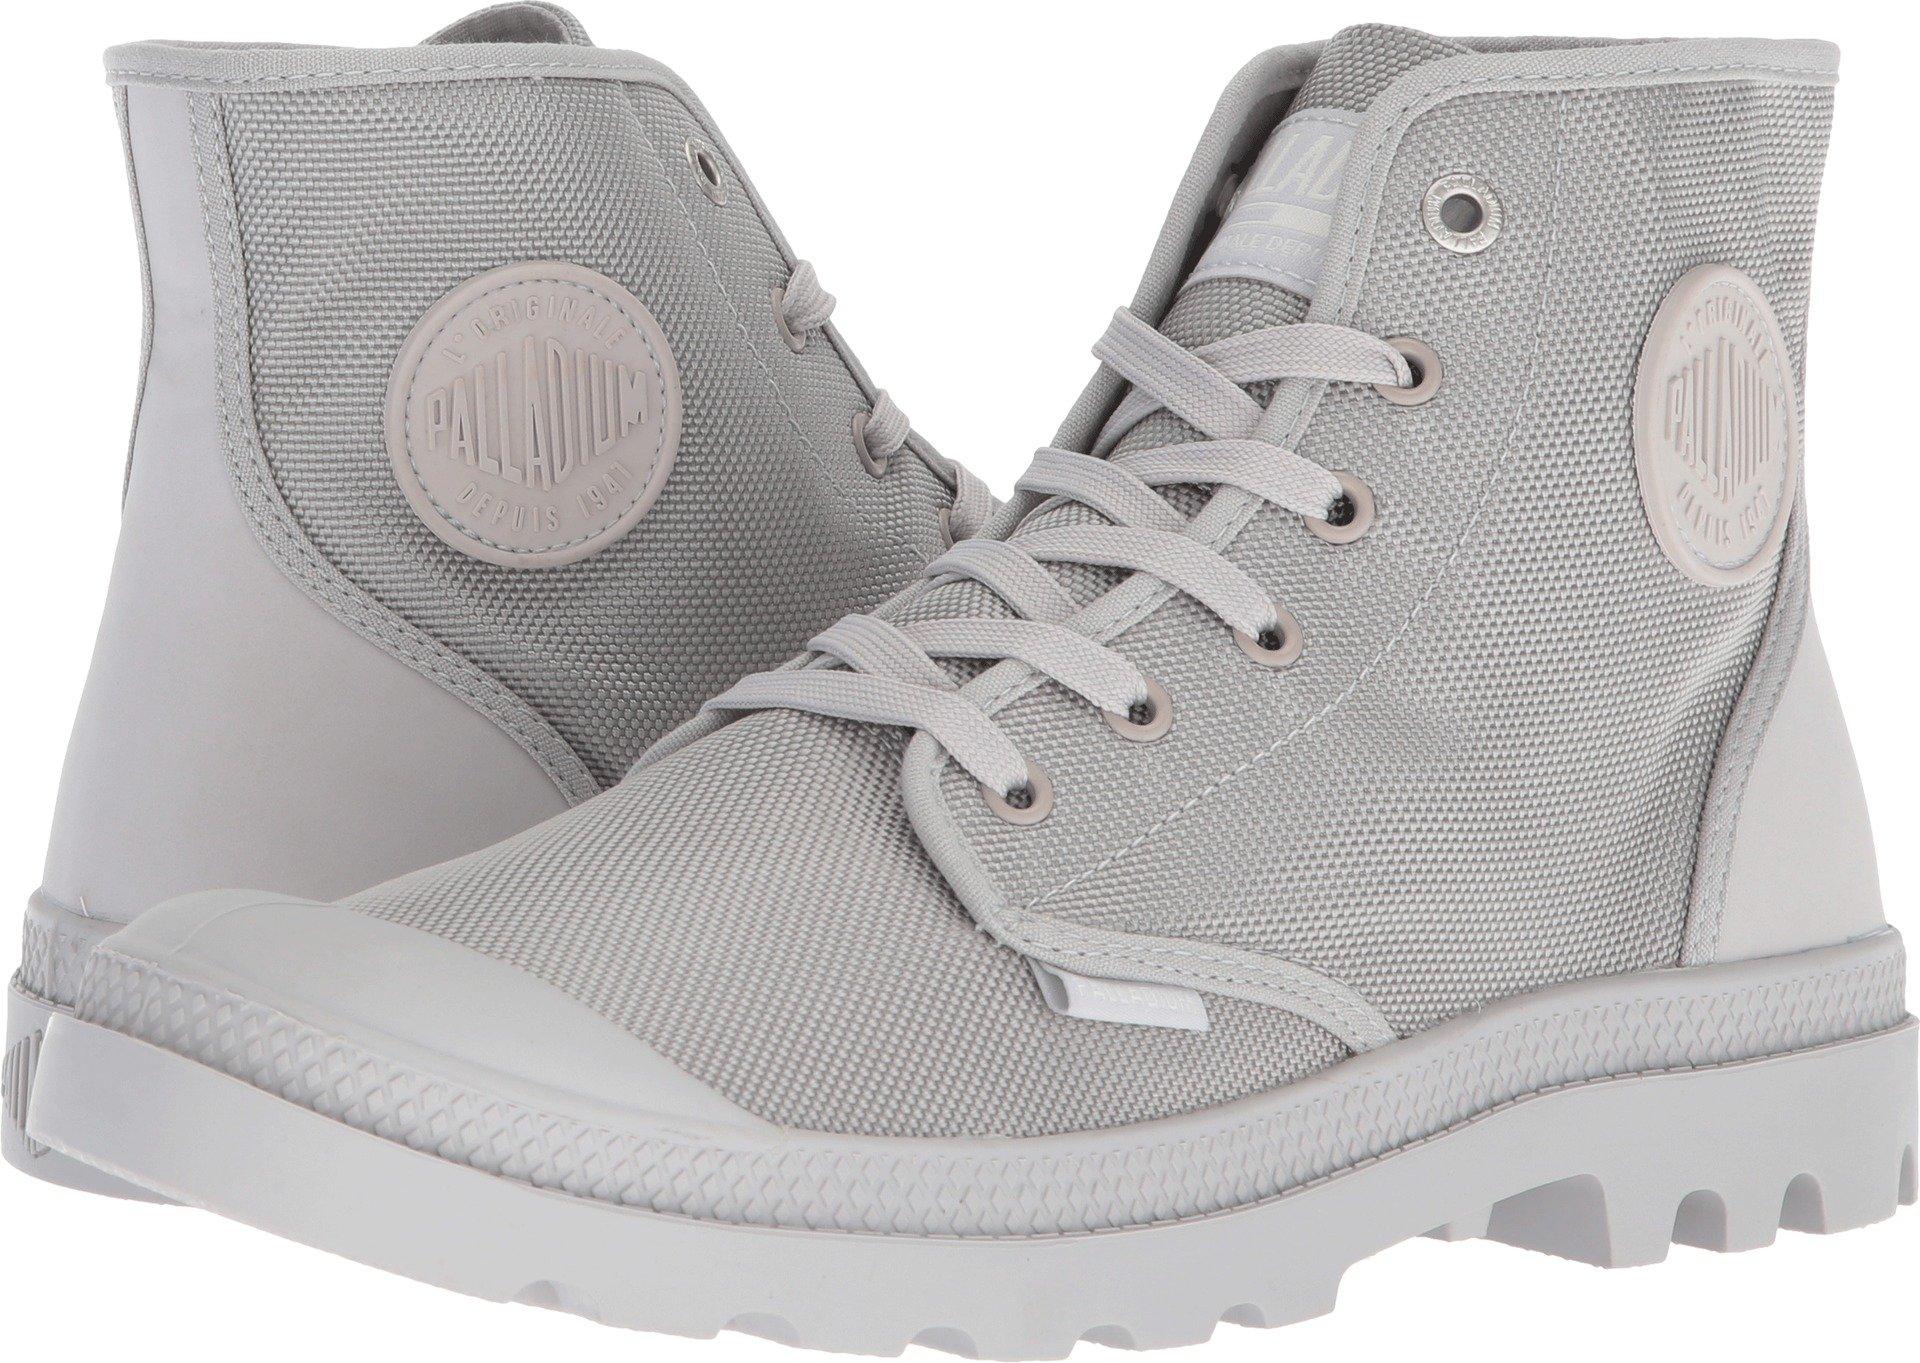 Palladium Unisex Mono Chrome II Lunar Rock Nylon Boots. Mens 8 Womens 9.5